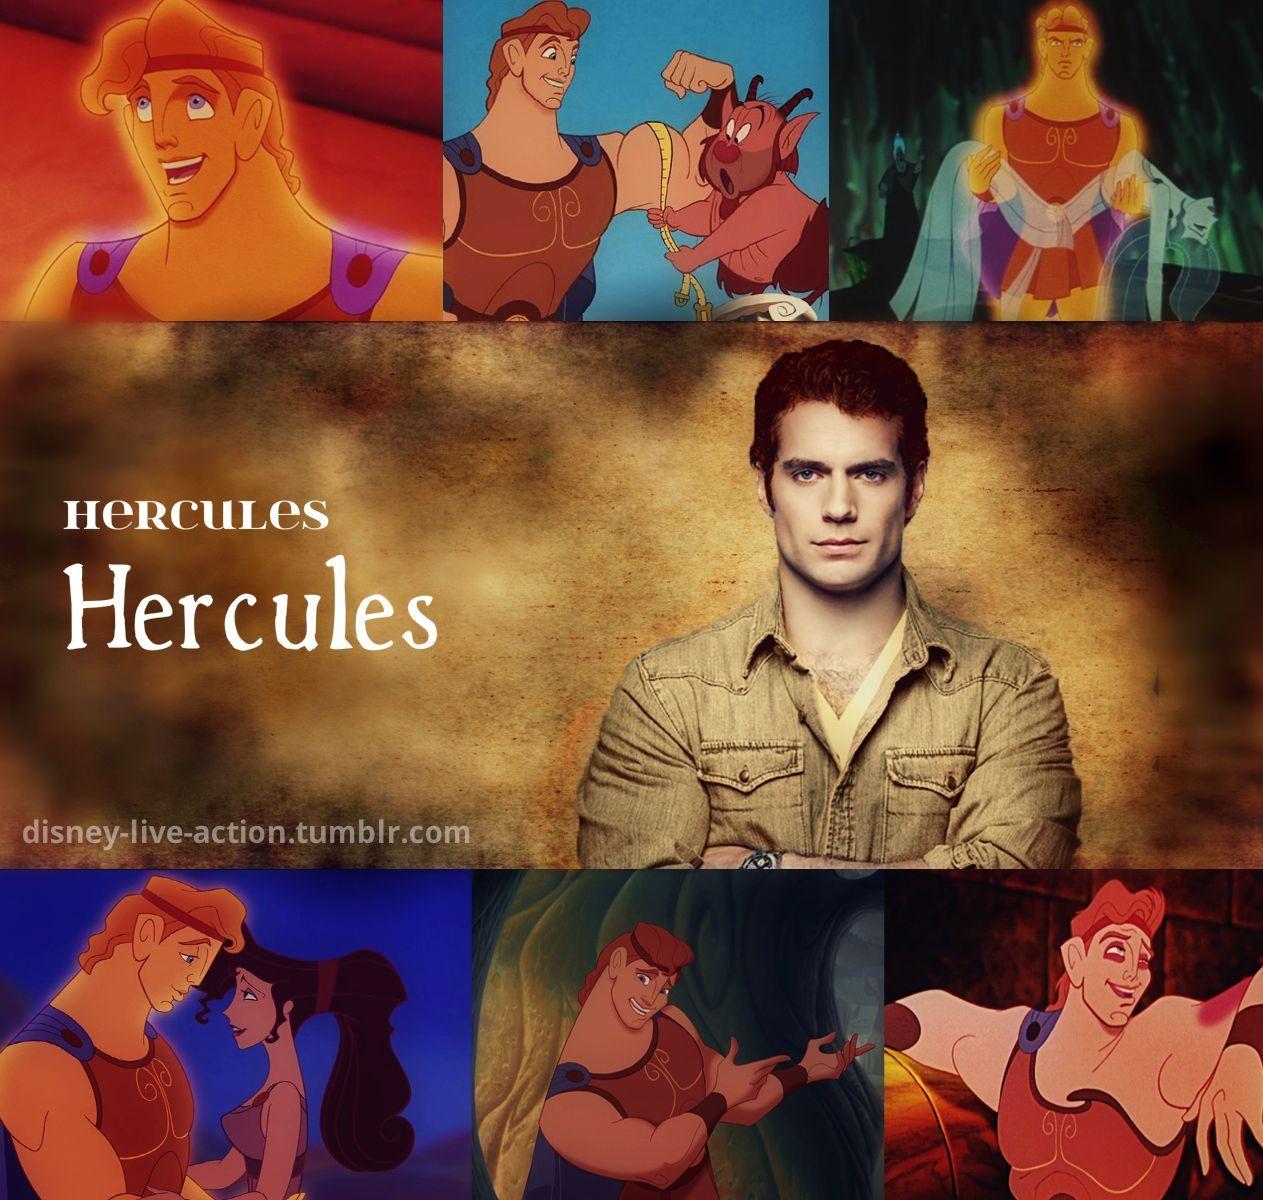 disney liveaction dream cast hercules henry cavill as